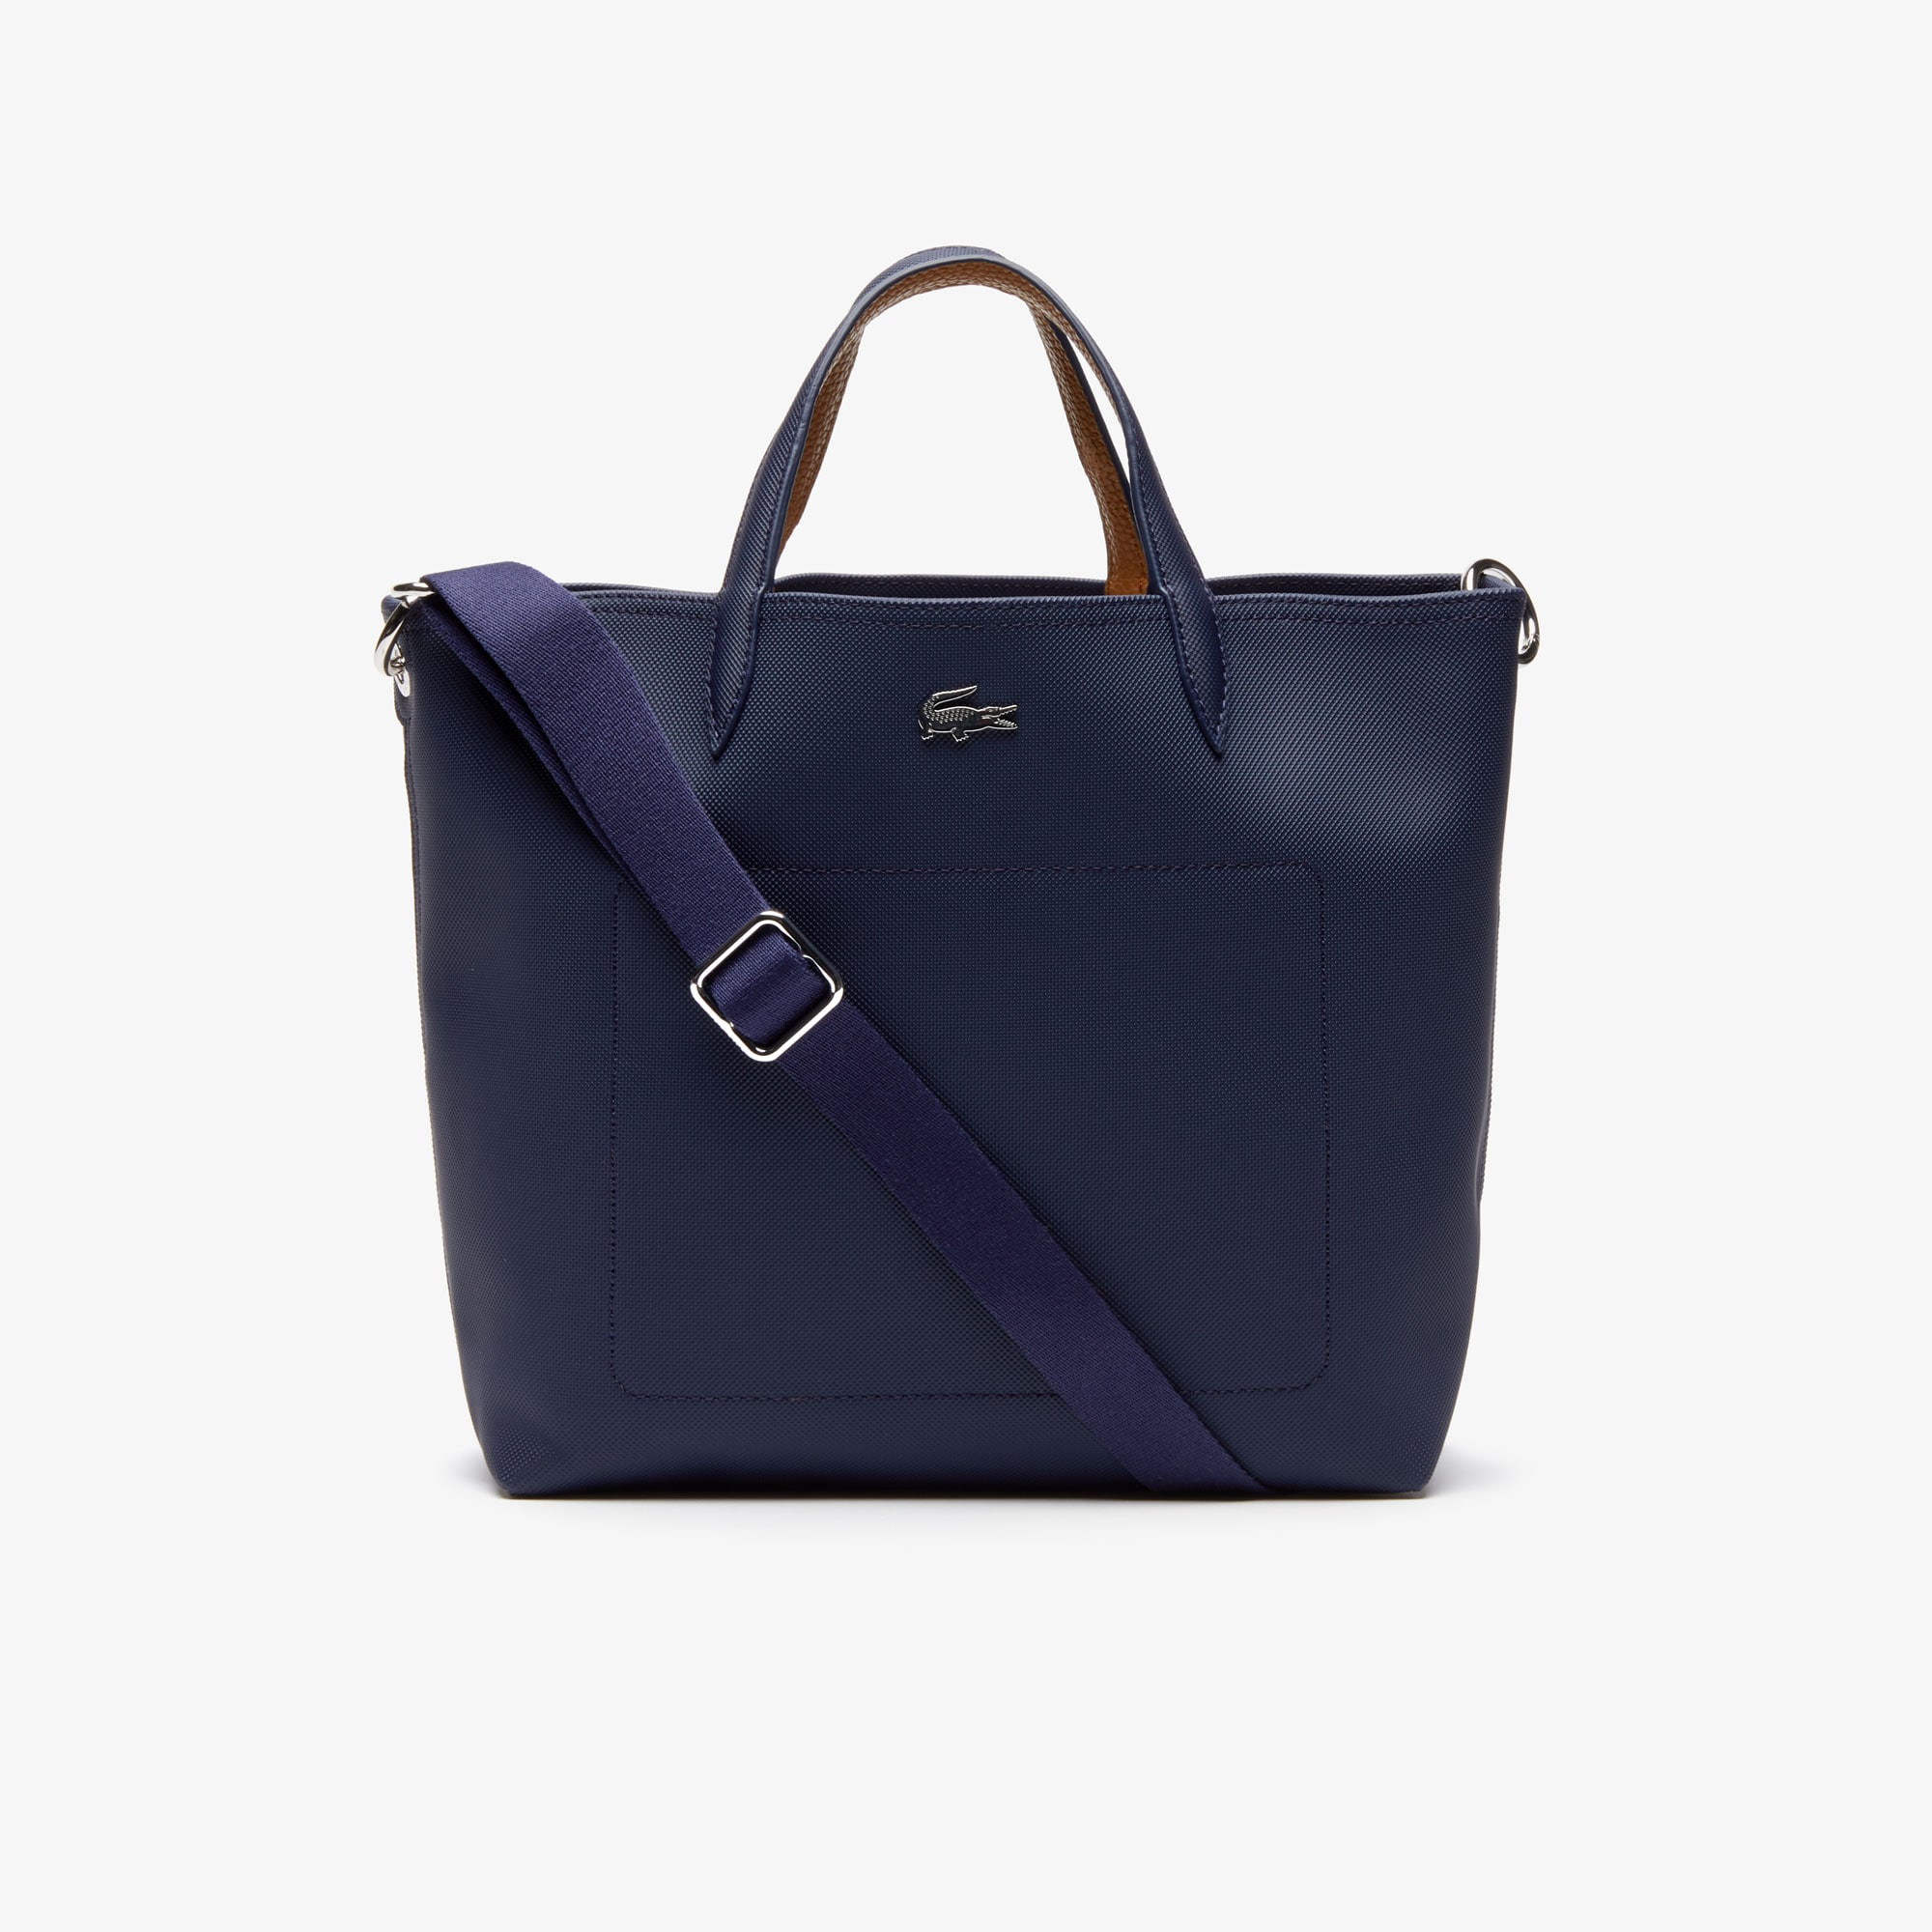 7344bb9dbb Sacs à main cuir, sacs cabas | Maroquinerie femme | LACOSTE